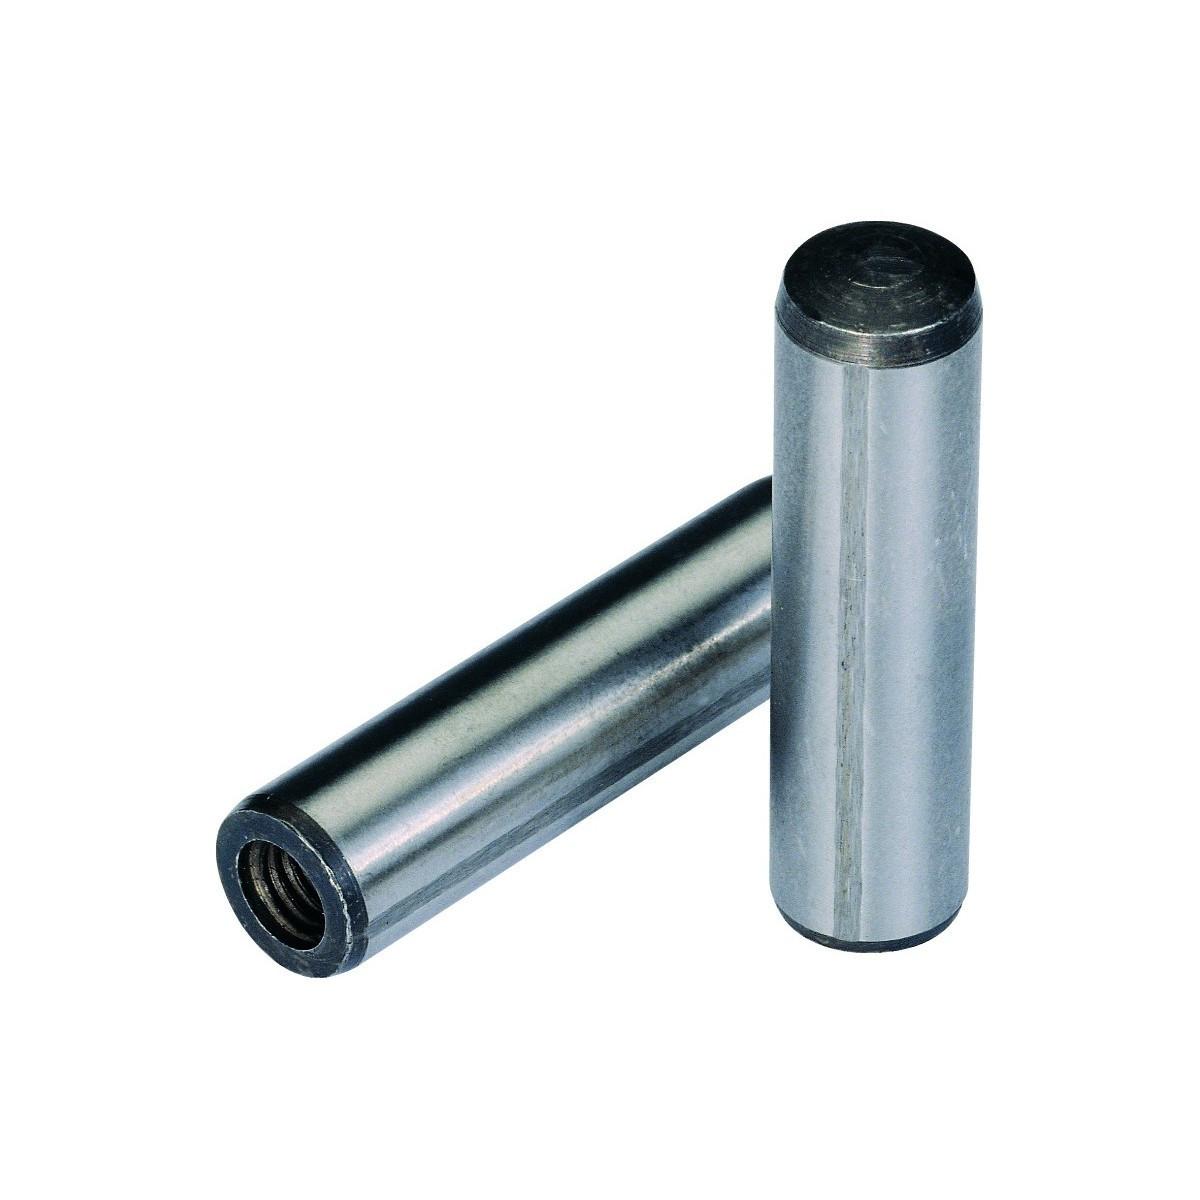 Штифт цилиндрический MMG  DIN 7979D M16 х 100 Класс 10.9 (Фосфат) 1 шт